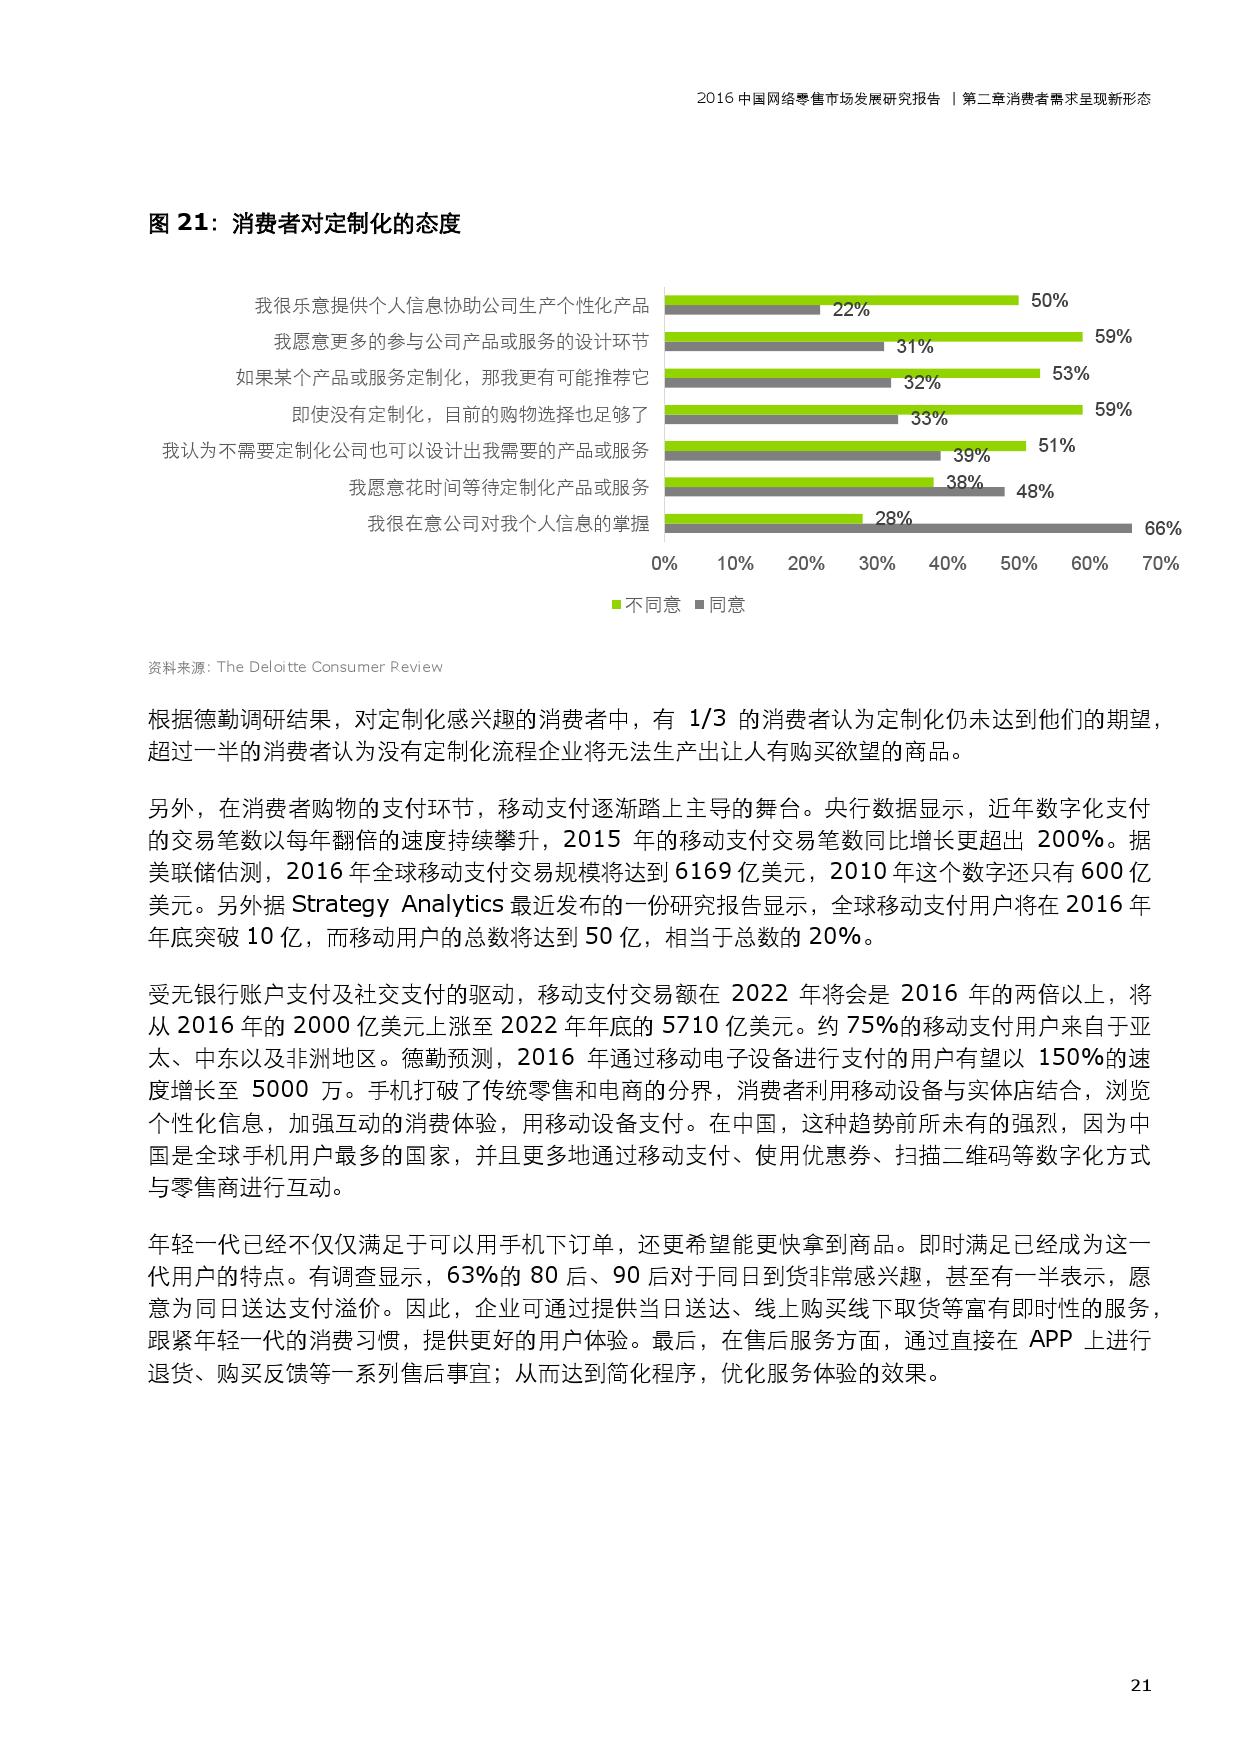 2016%e4%b8%ad%e5%9b%bd%e7%bd%91%e7%bb%9c%e9%9b%b6%e5%94%ae%e5%b8%82%e5%9c%ba%e5%8f%91%e5%b1%95%e7%a0%94%e7%a9%b6%e6%8a%a5%e5%91%8a_000025